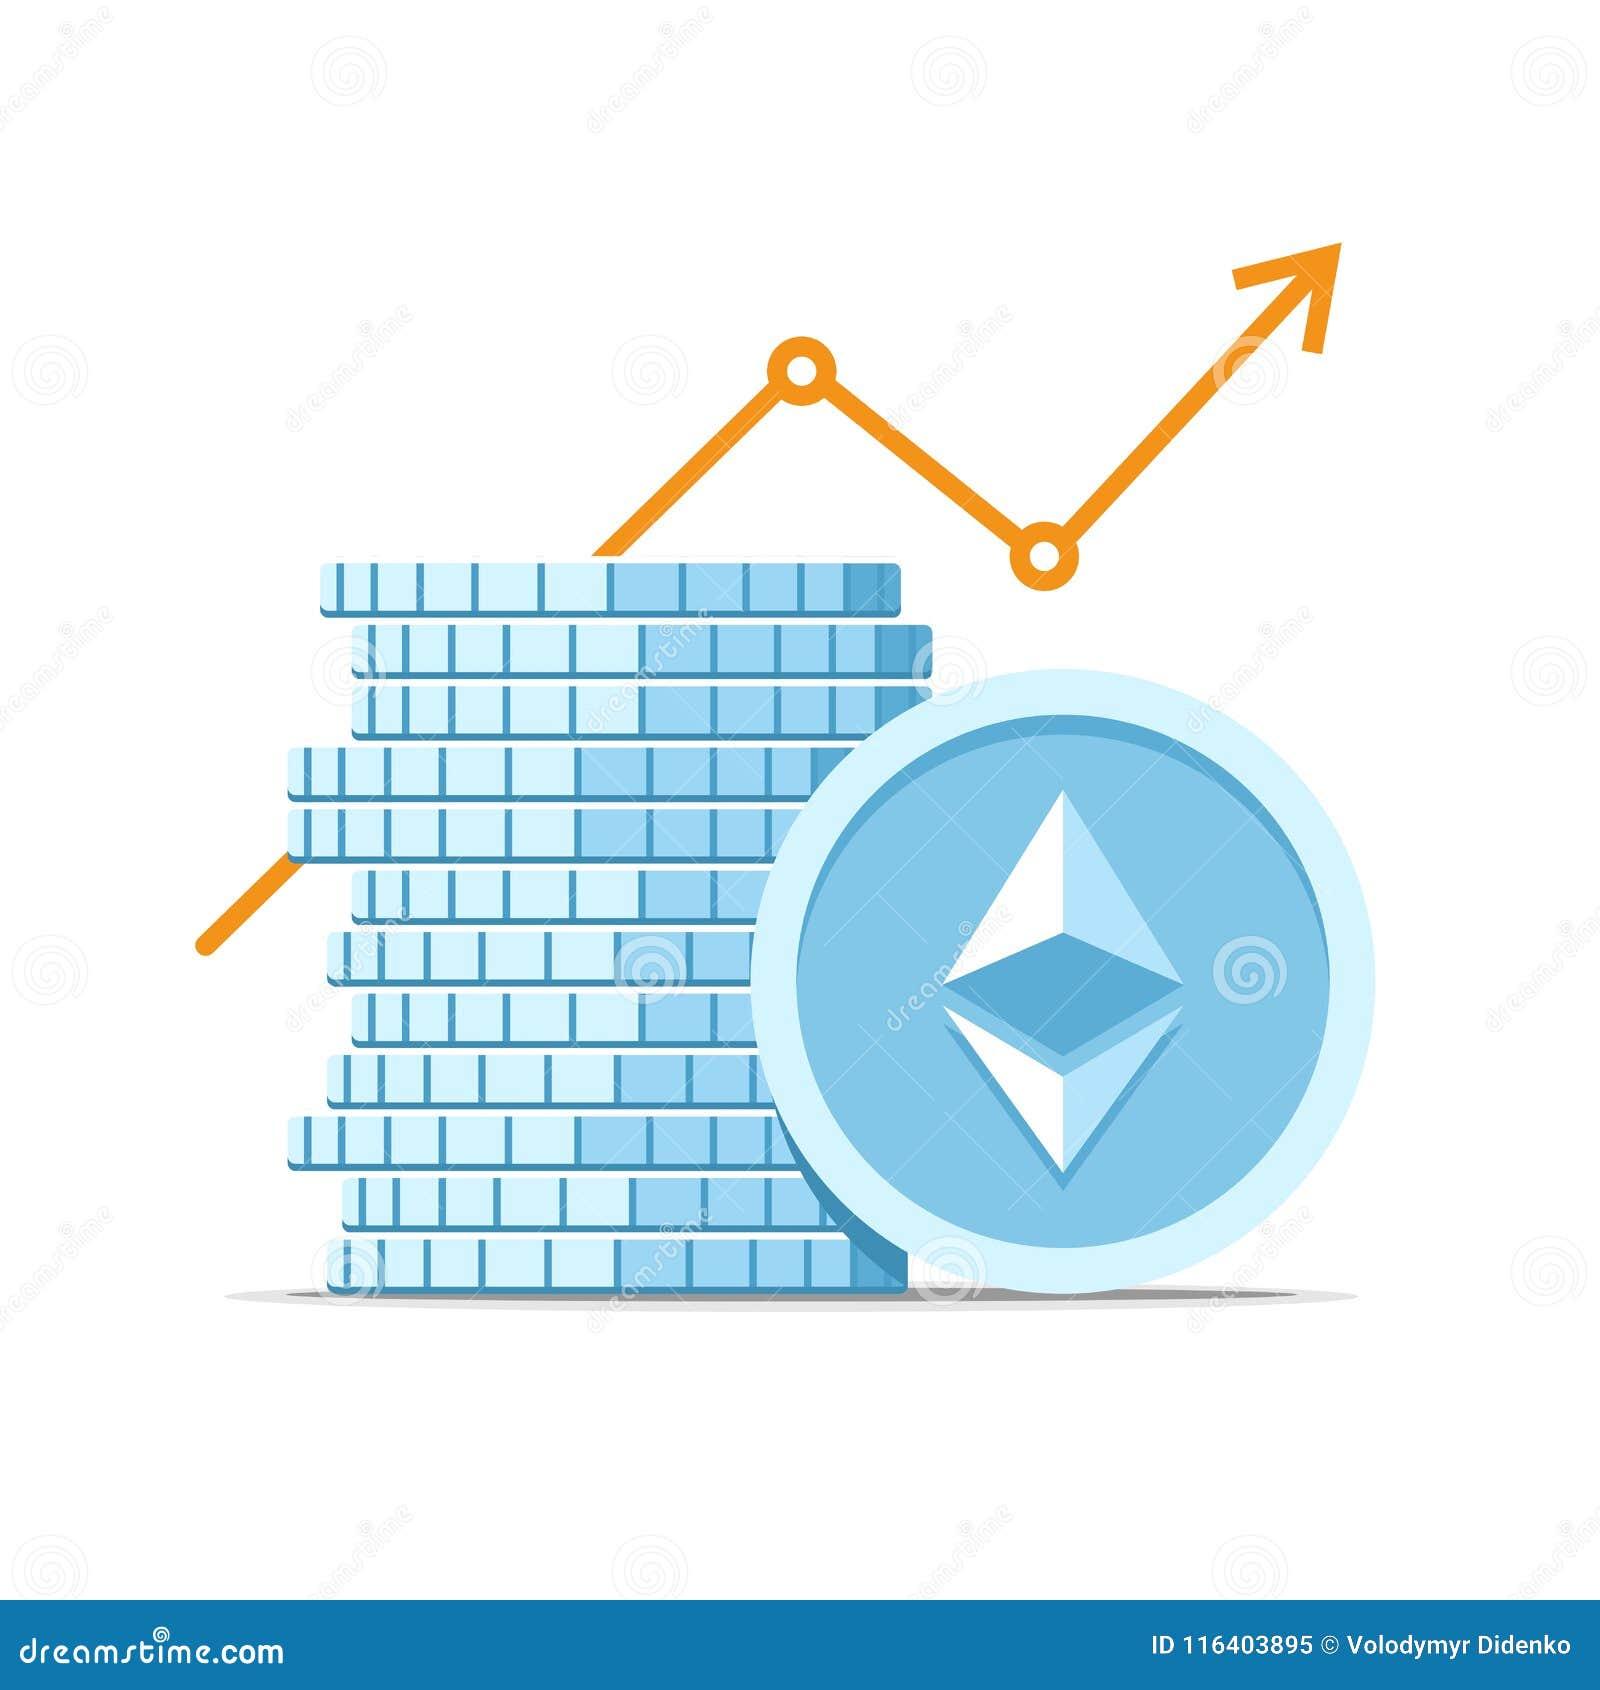 ethereum cryptocurrency value